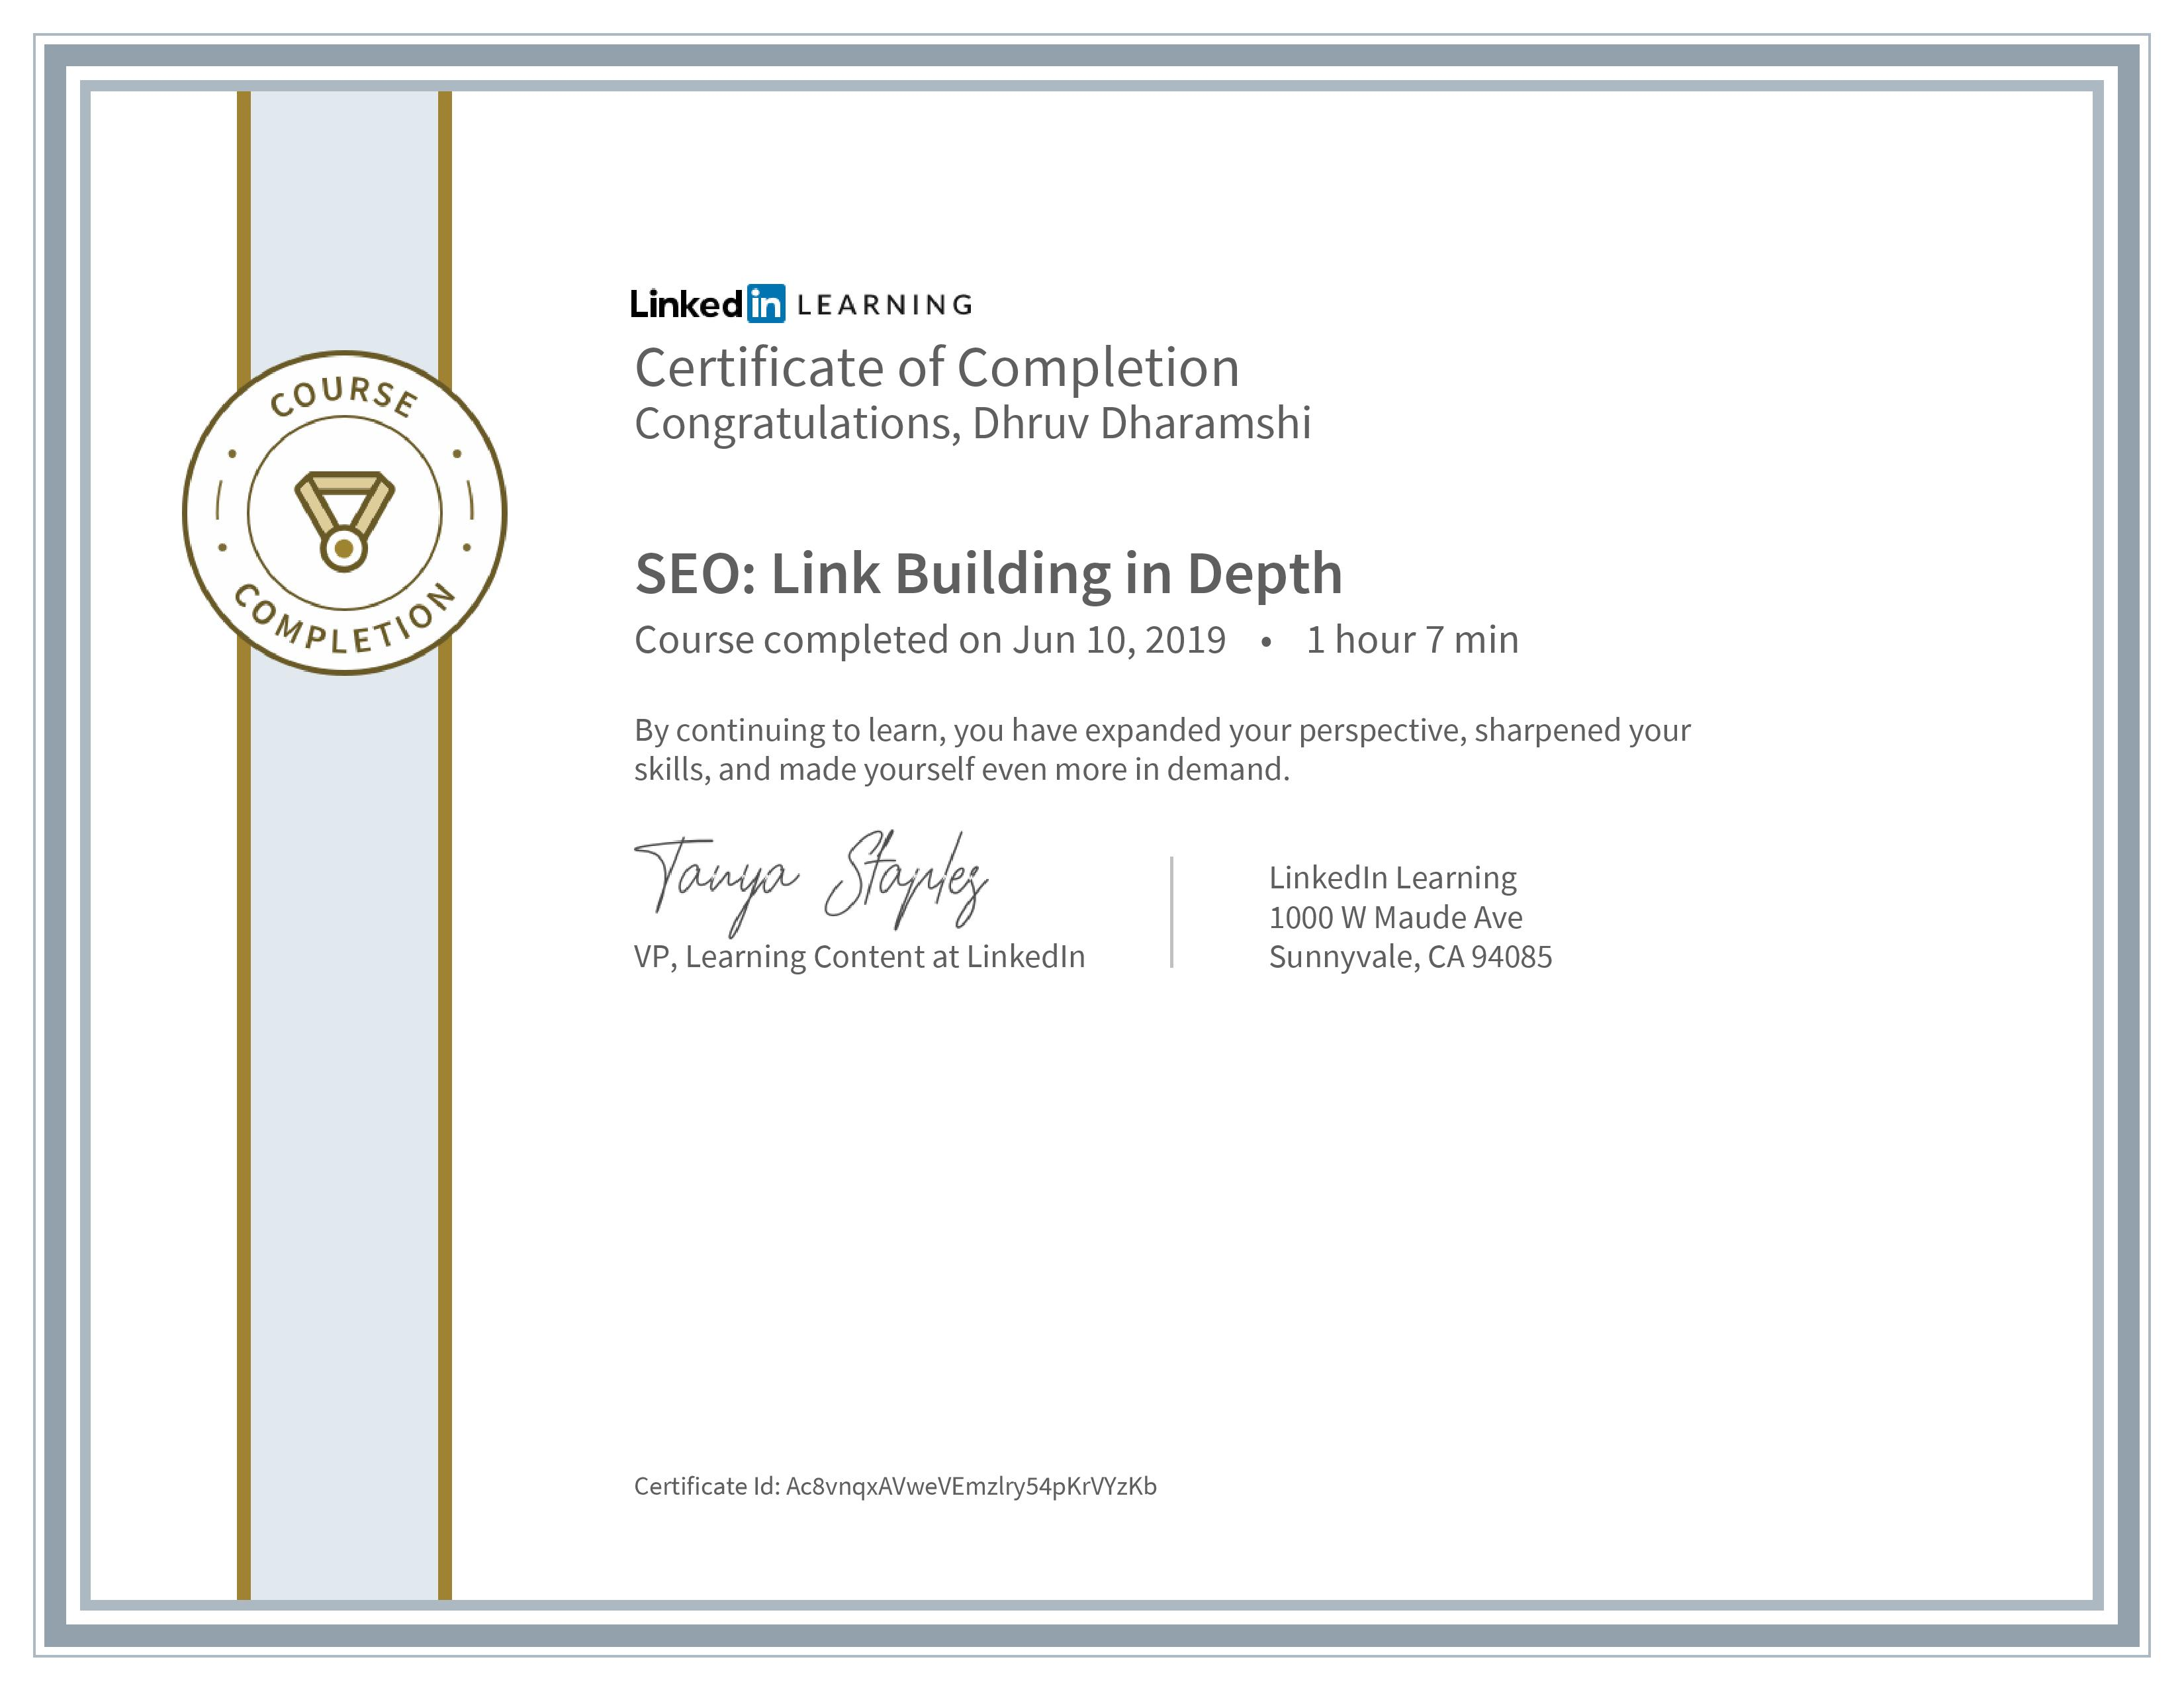 SEO: Link Building in Depth